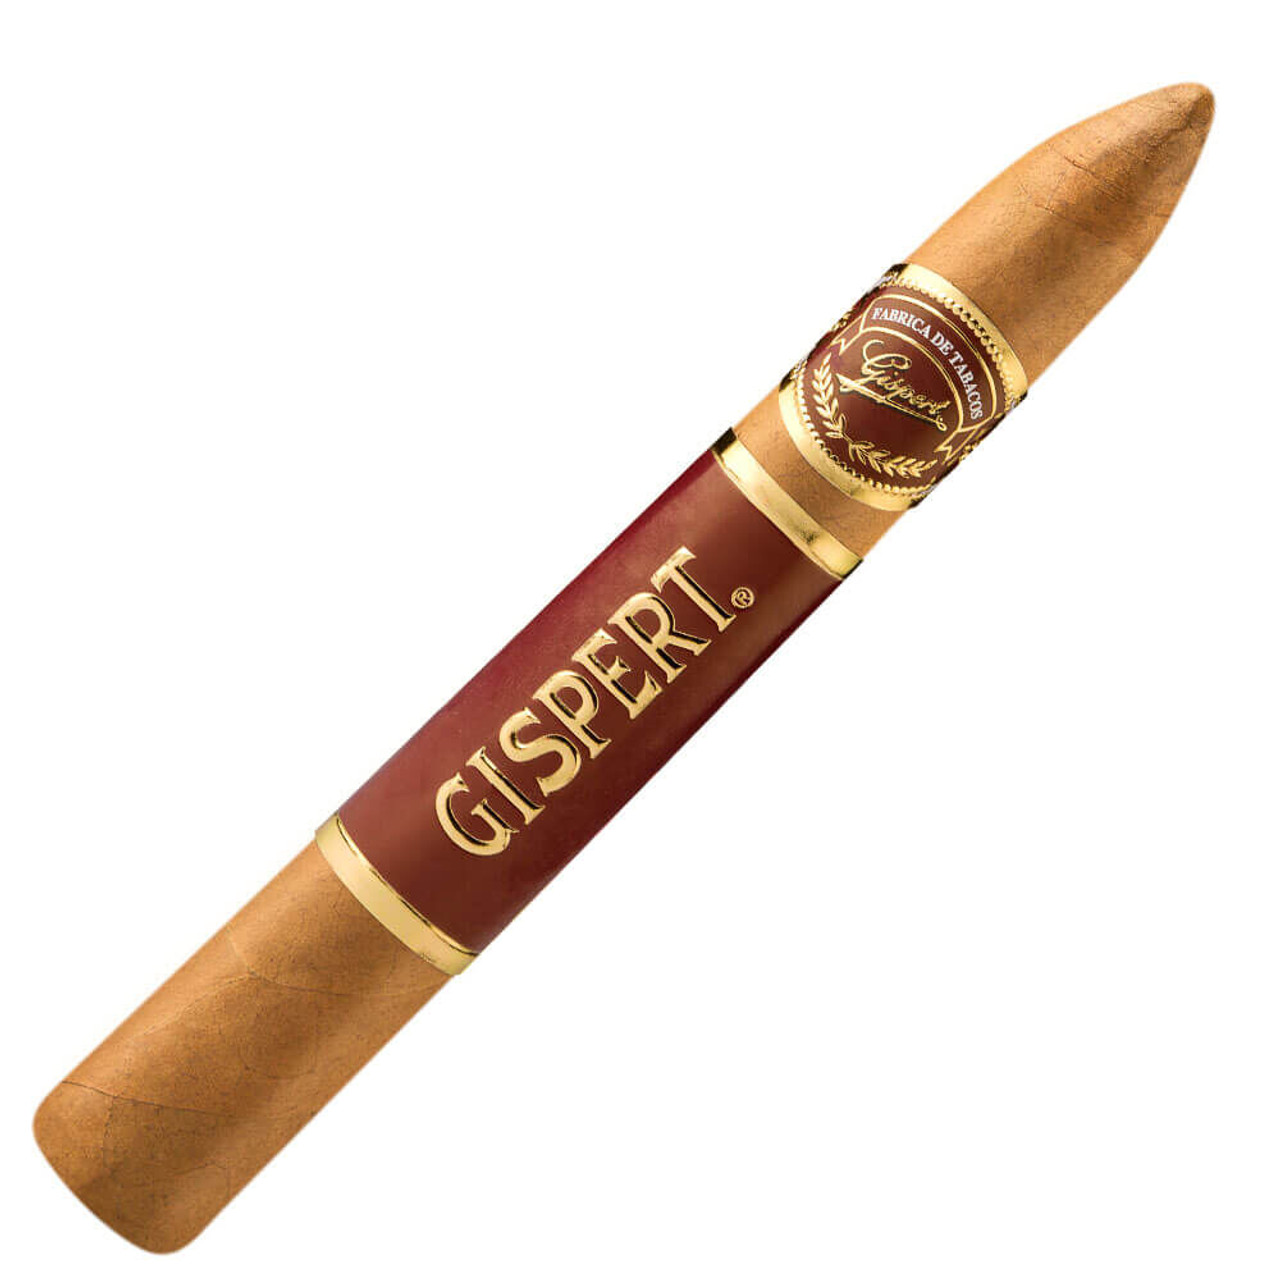 Gispert Belicoso Cigars - 6.12 x 52 (Pack of 5)